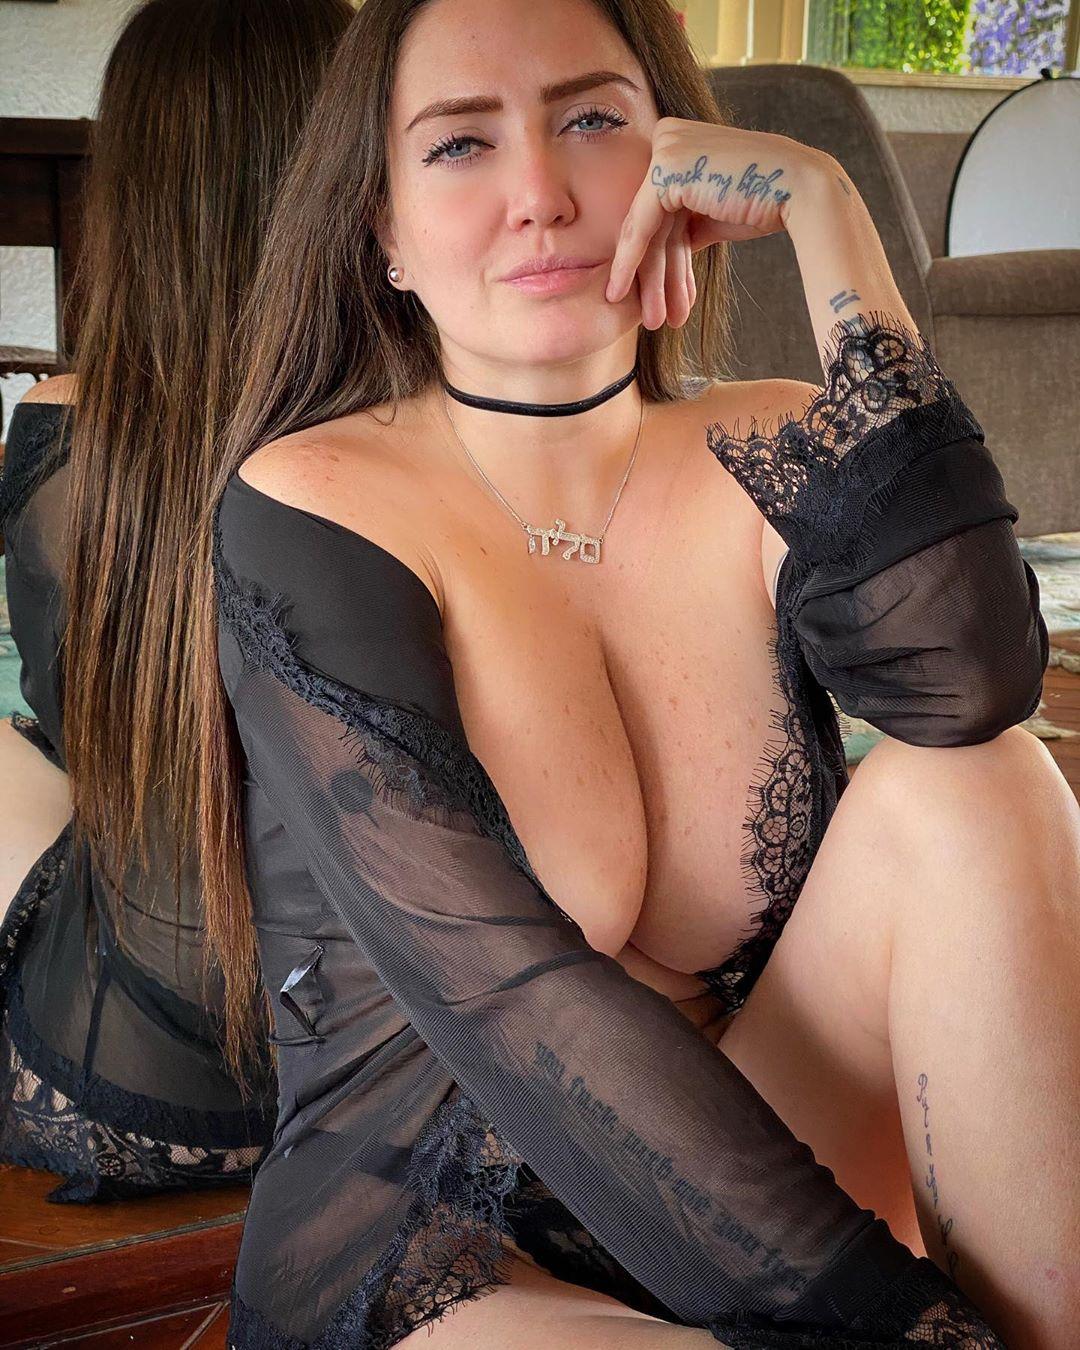 Celia Lora pic